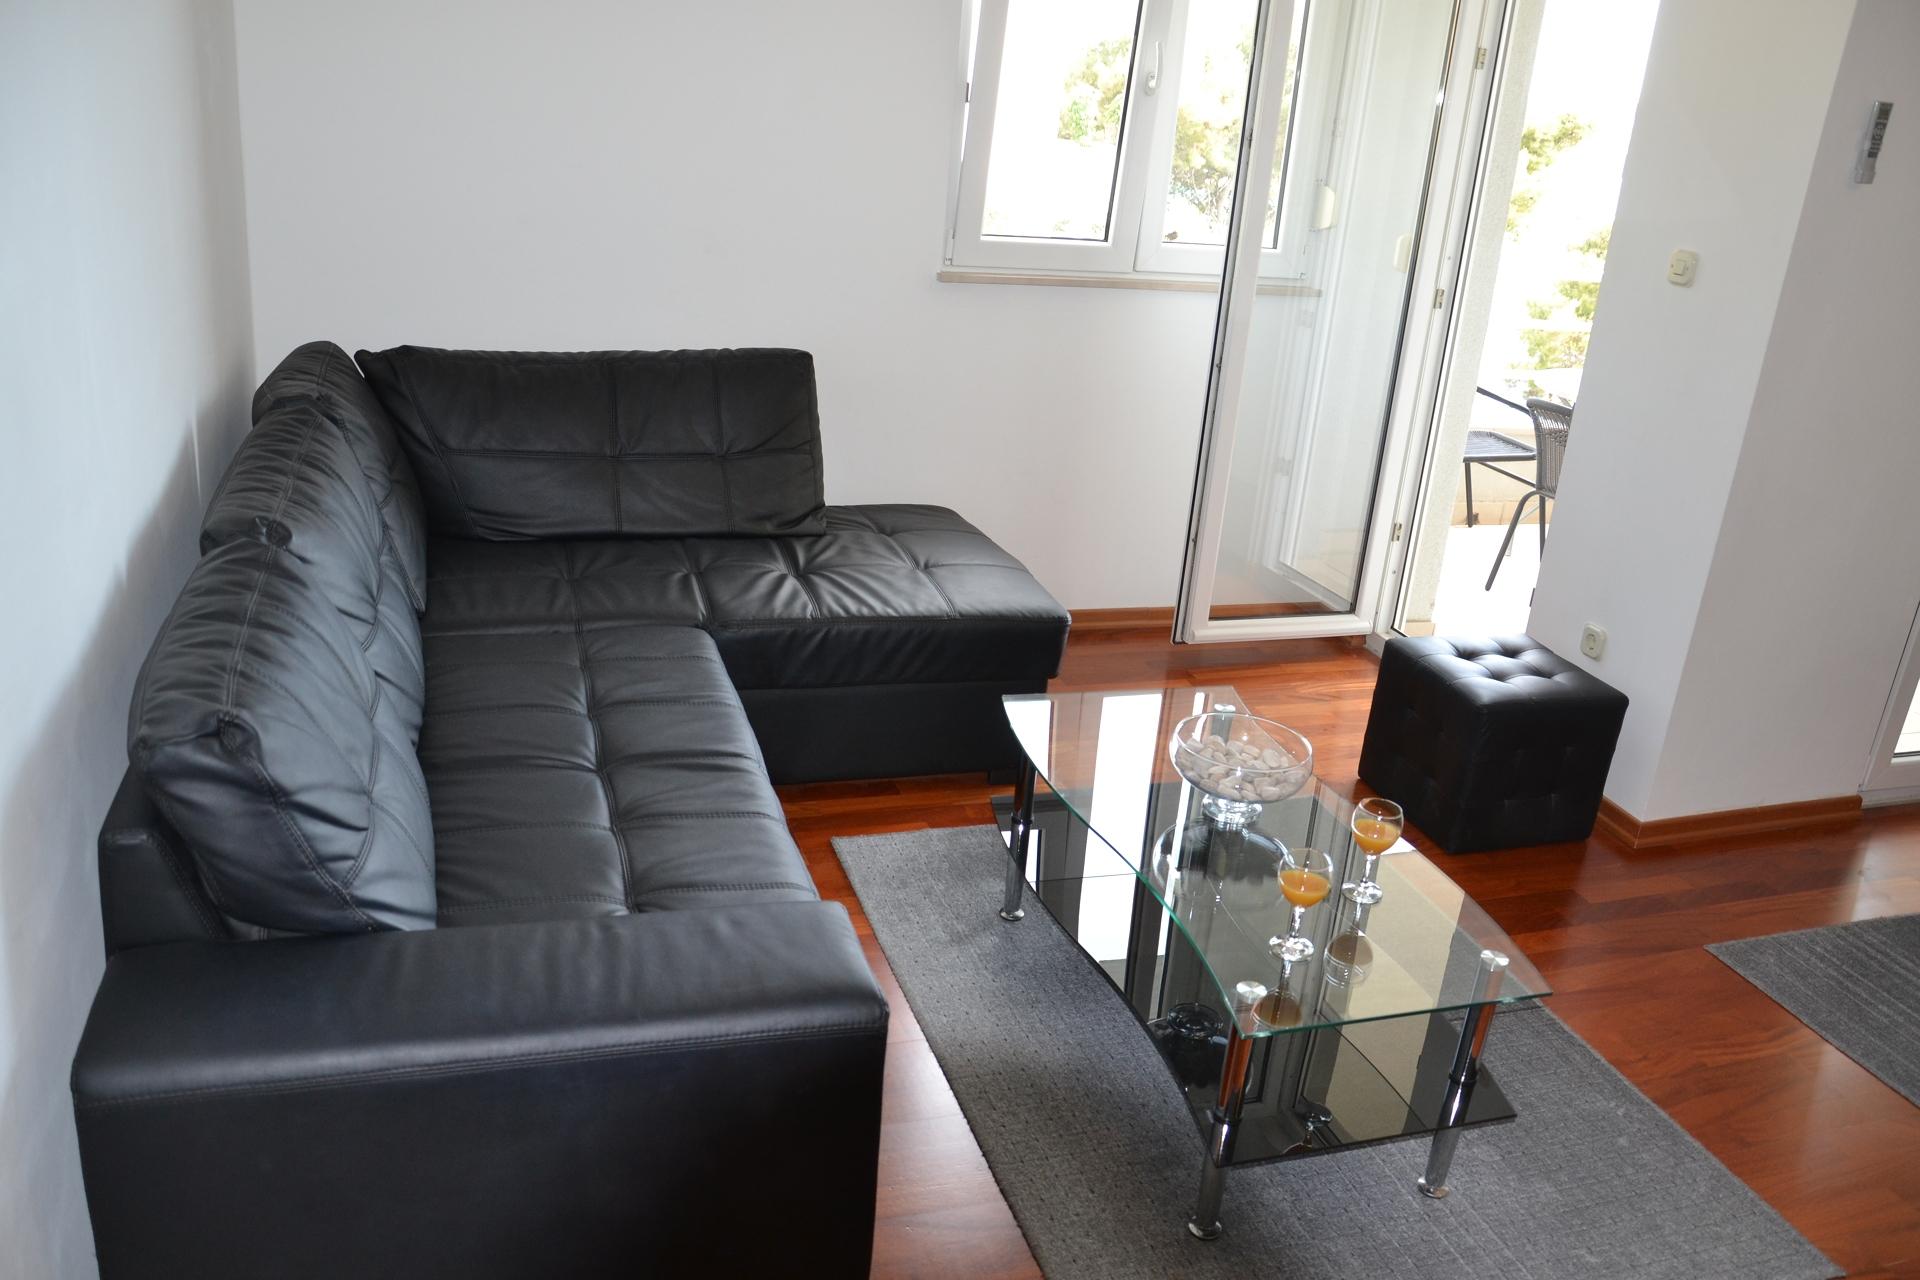 34989  - Trogir - Appartements Croatie - A3(4+2): séjour